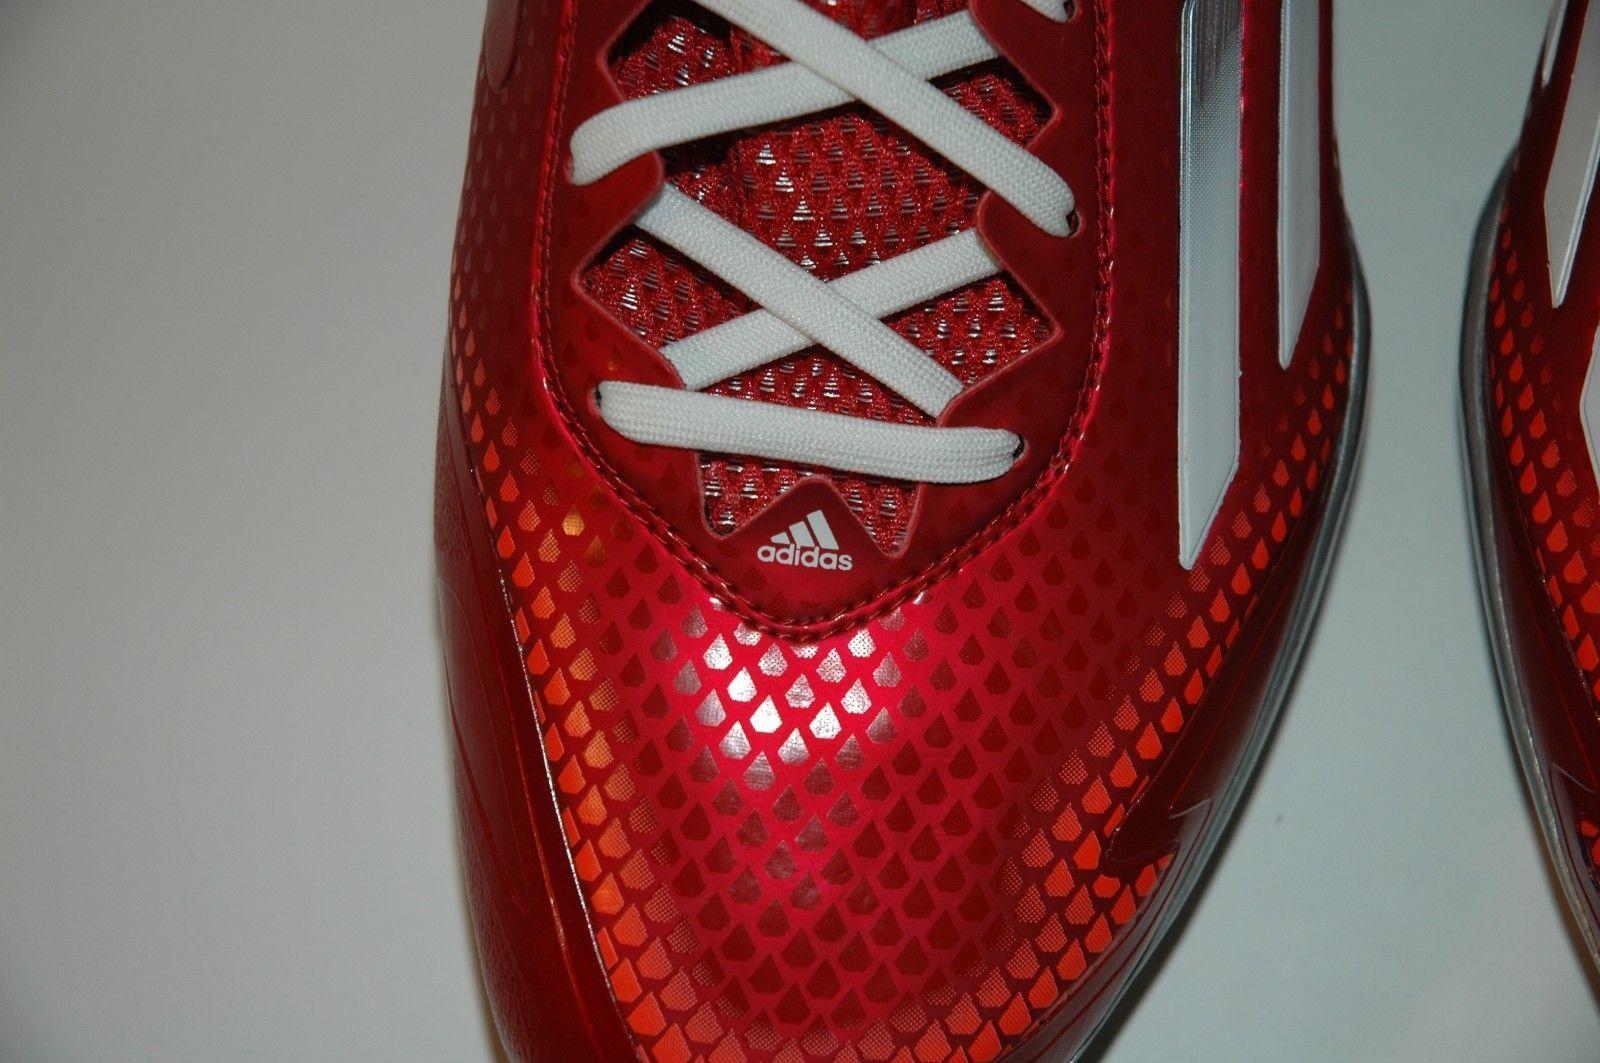 cheap for discount 1bec0 77b43 Adidas Adizero Afterburner 2.0 Metal and 50 similar items